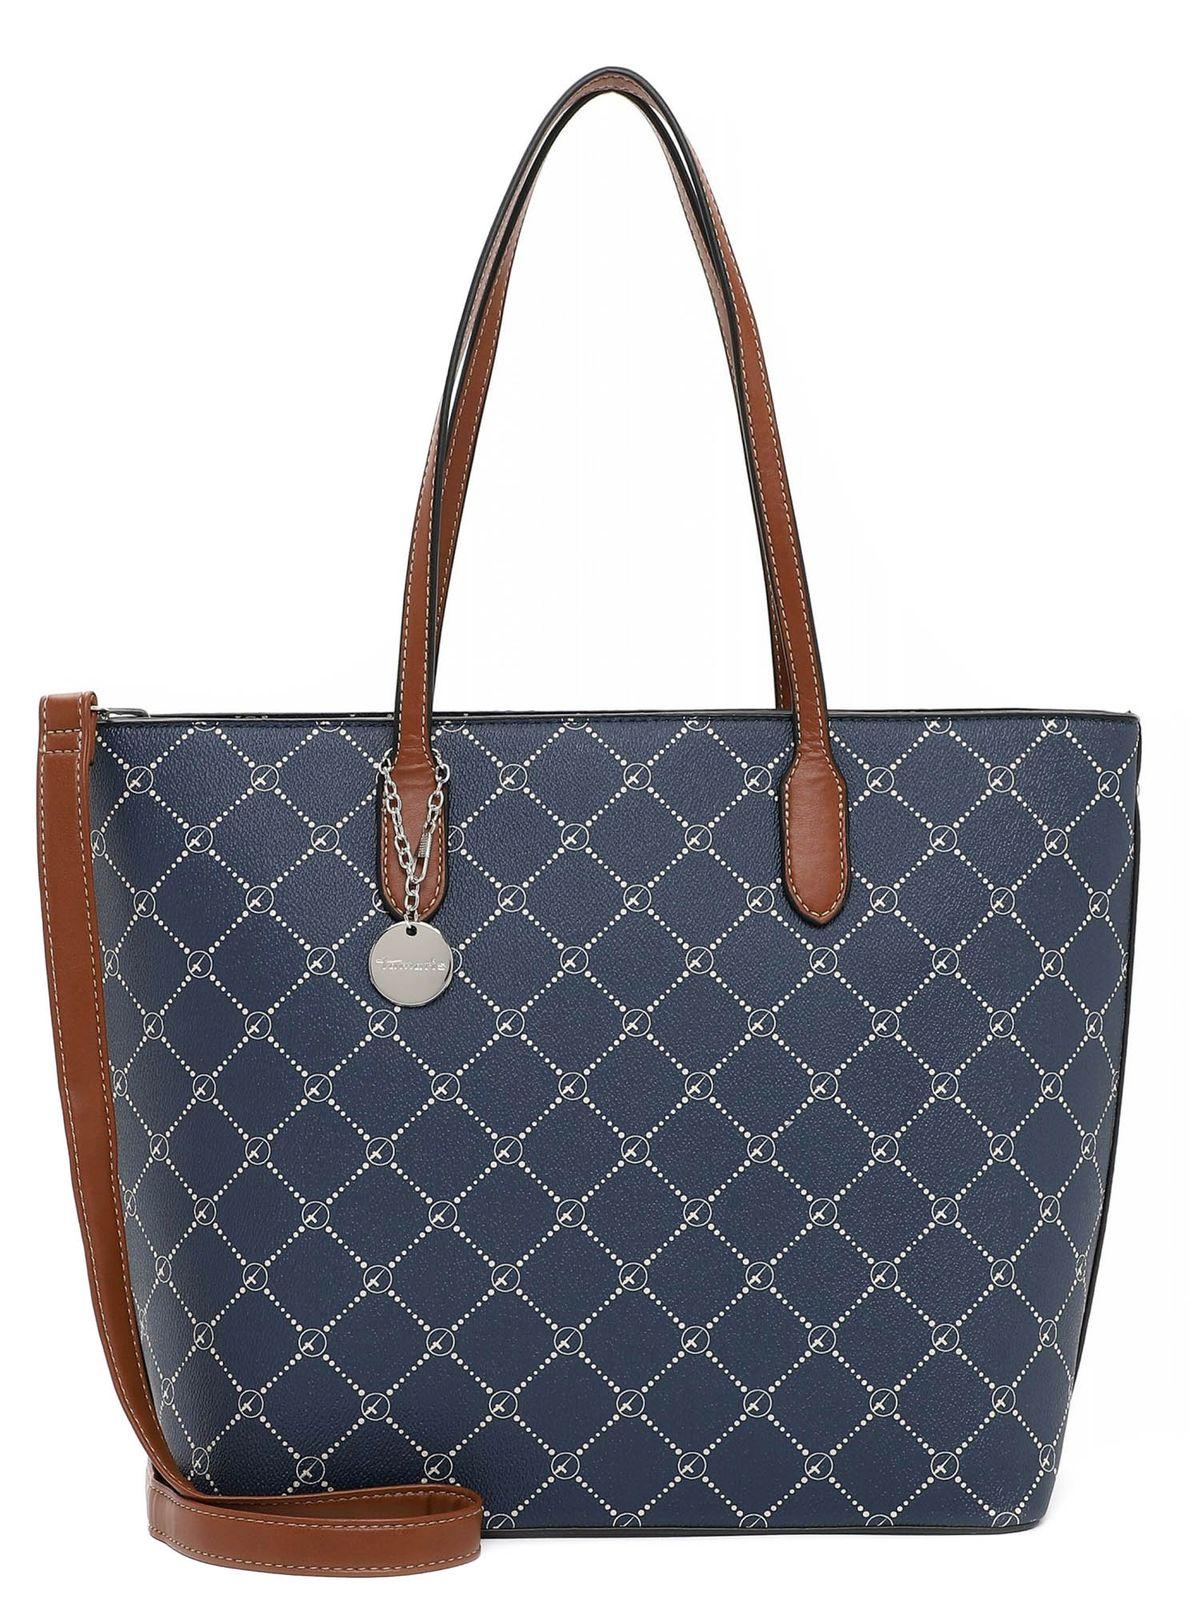 Tamaris Anastasia Shopping Bag Smokeblue